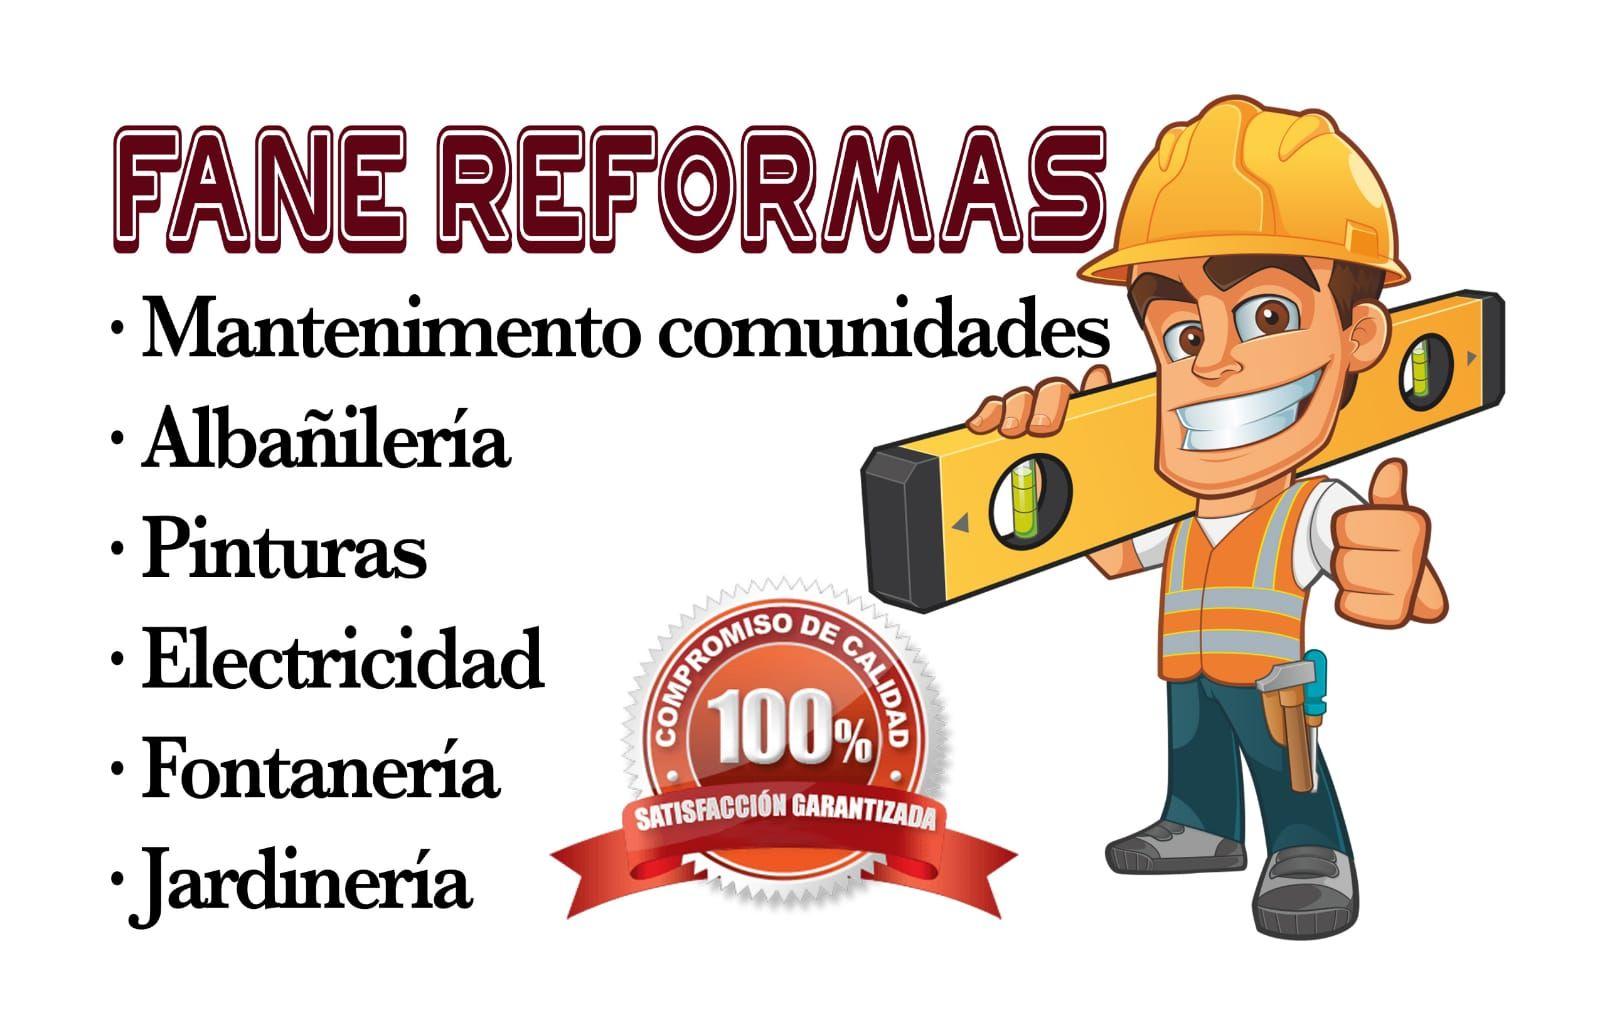 Fane Reformas